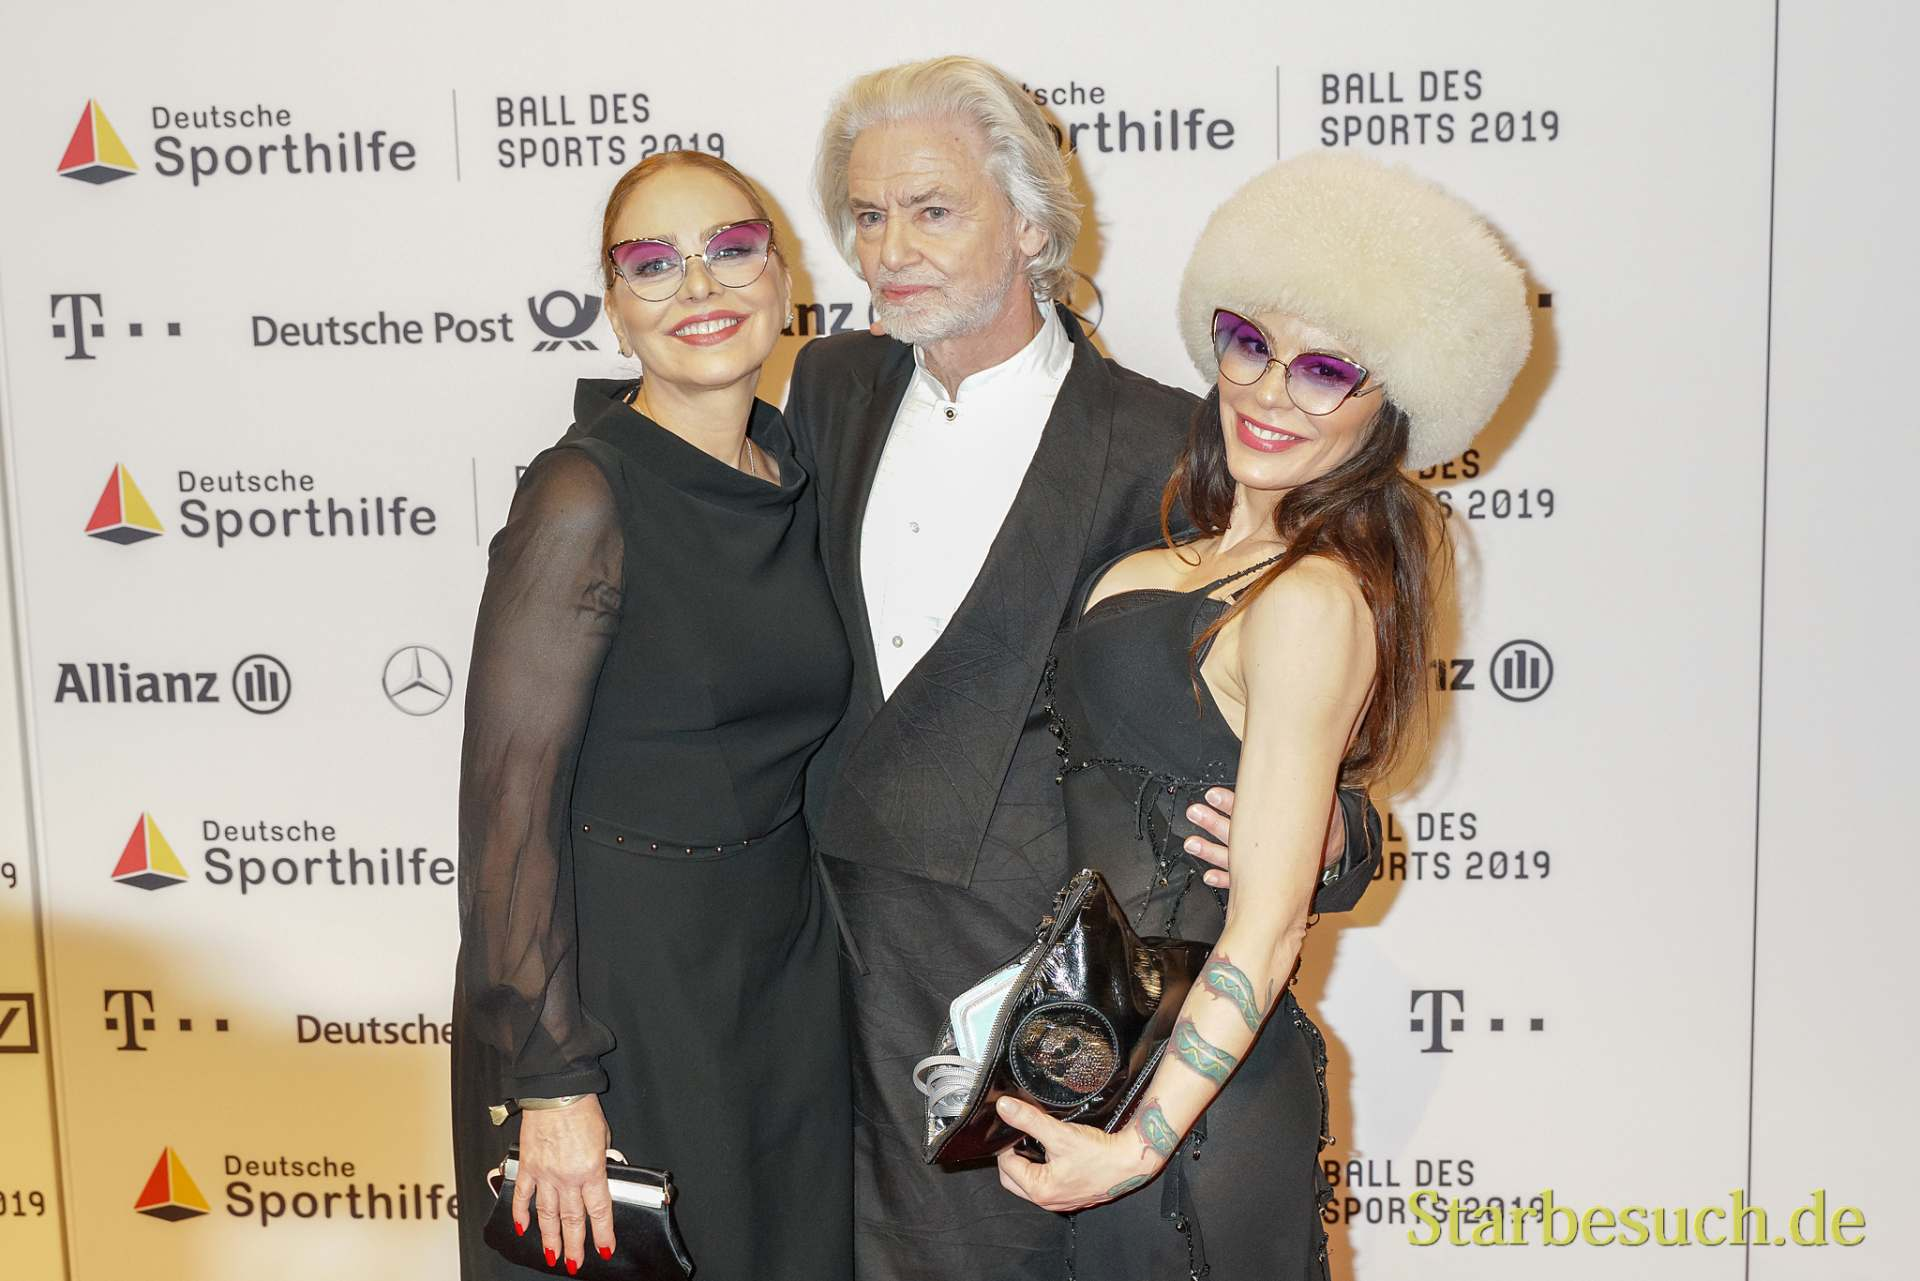 WIESBADEN, Germany - February 2nd, 2019: Ornella Muti, Hermann Bühlbecker and Naike Rivelli at Ball des Sports 2019